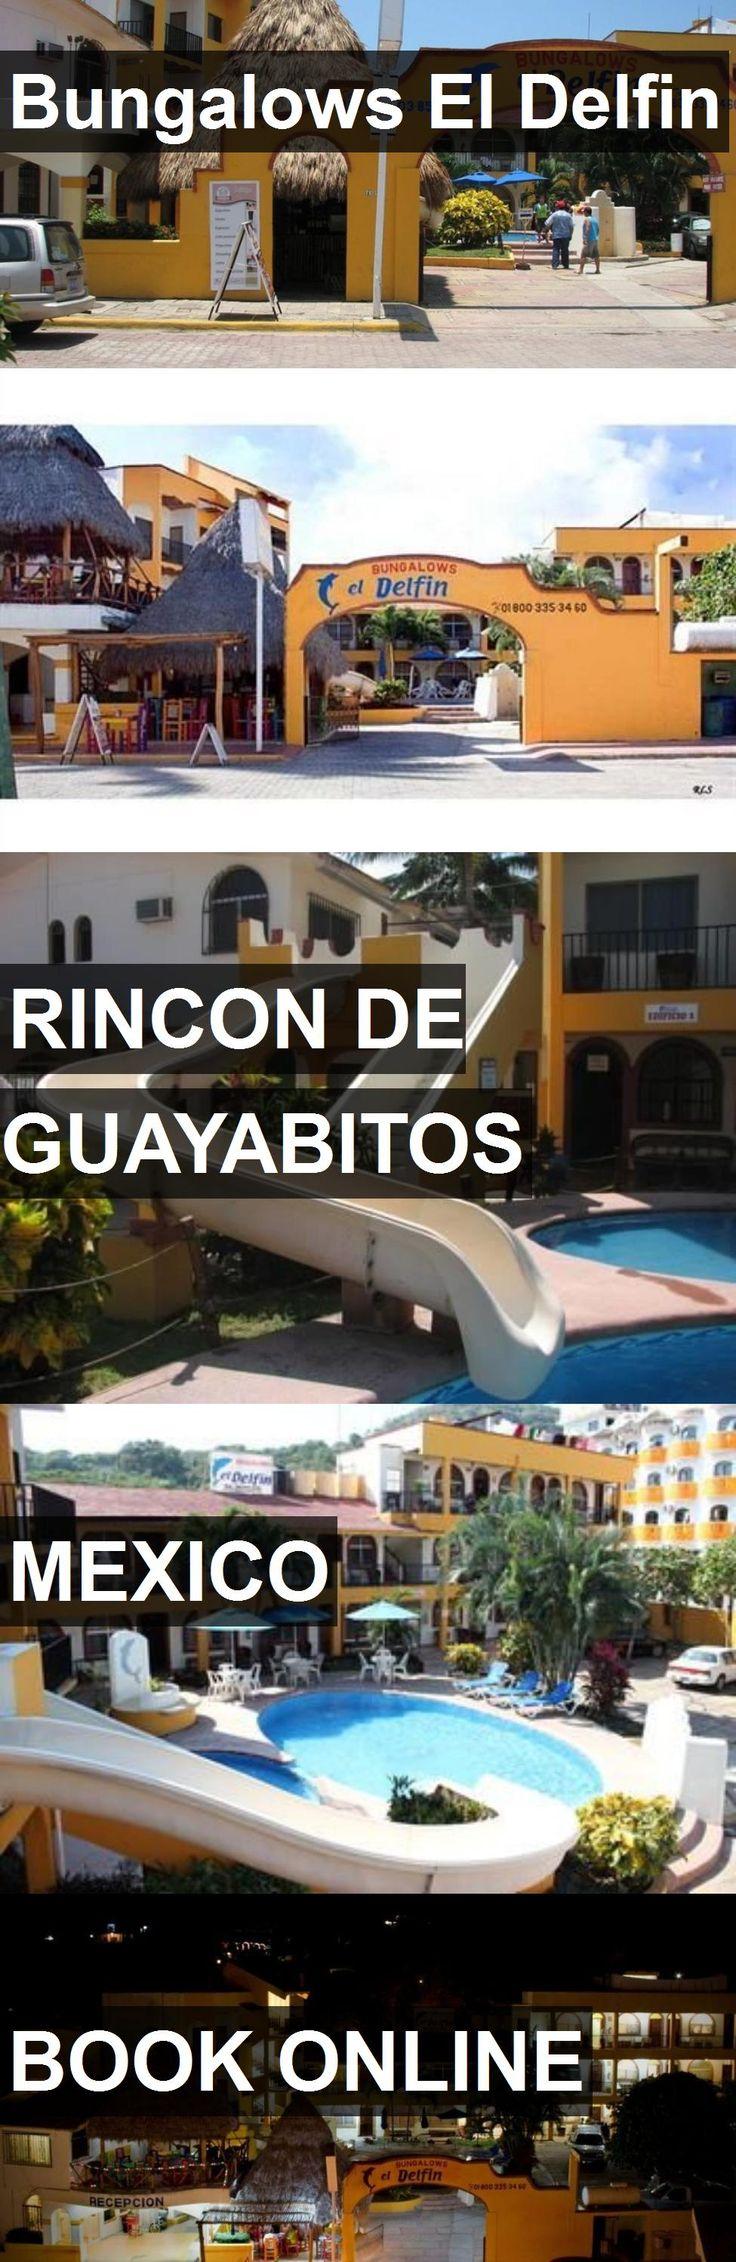 Hotel Bungalows El Delfin in Rincon de Guayabitos, Mexico. For more information, photos, reviews and best prices please follow the link. #Mexico #RincondeGuayabitos #travel #vacation #hotel